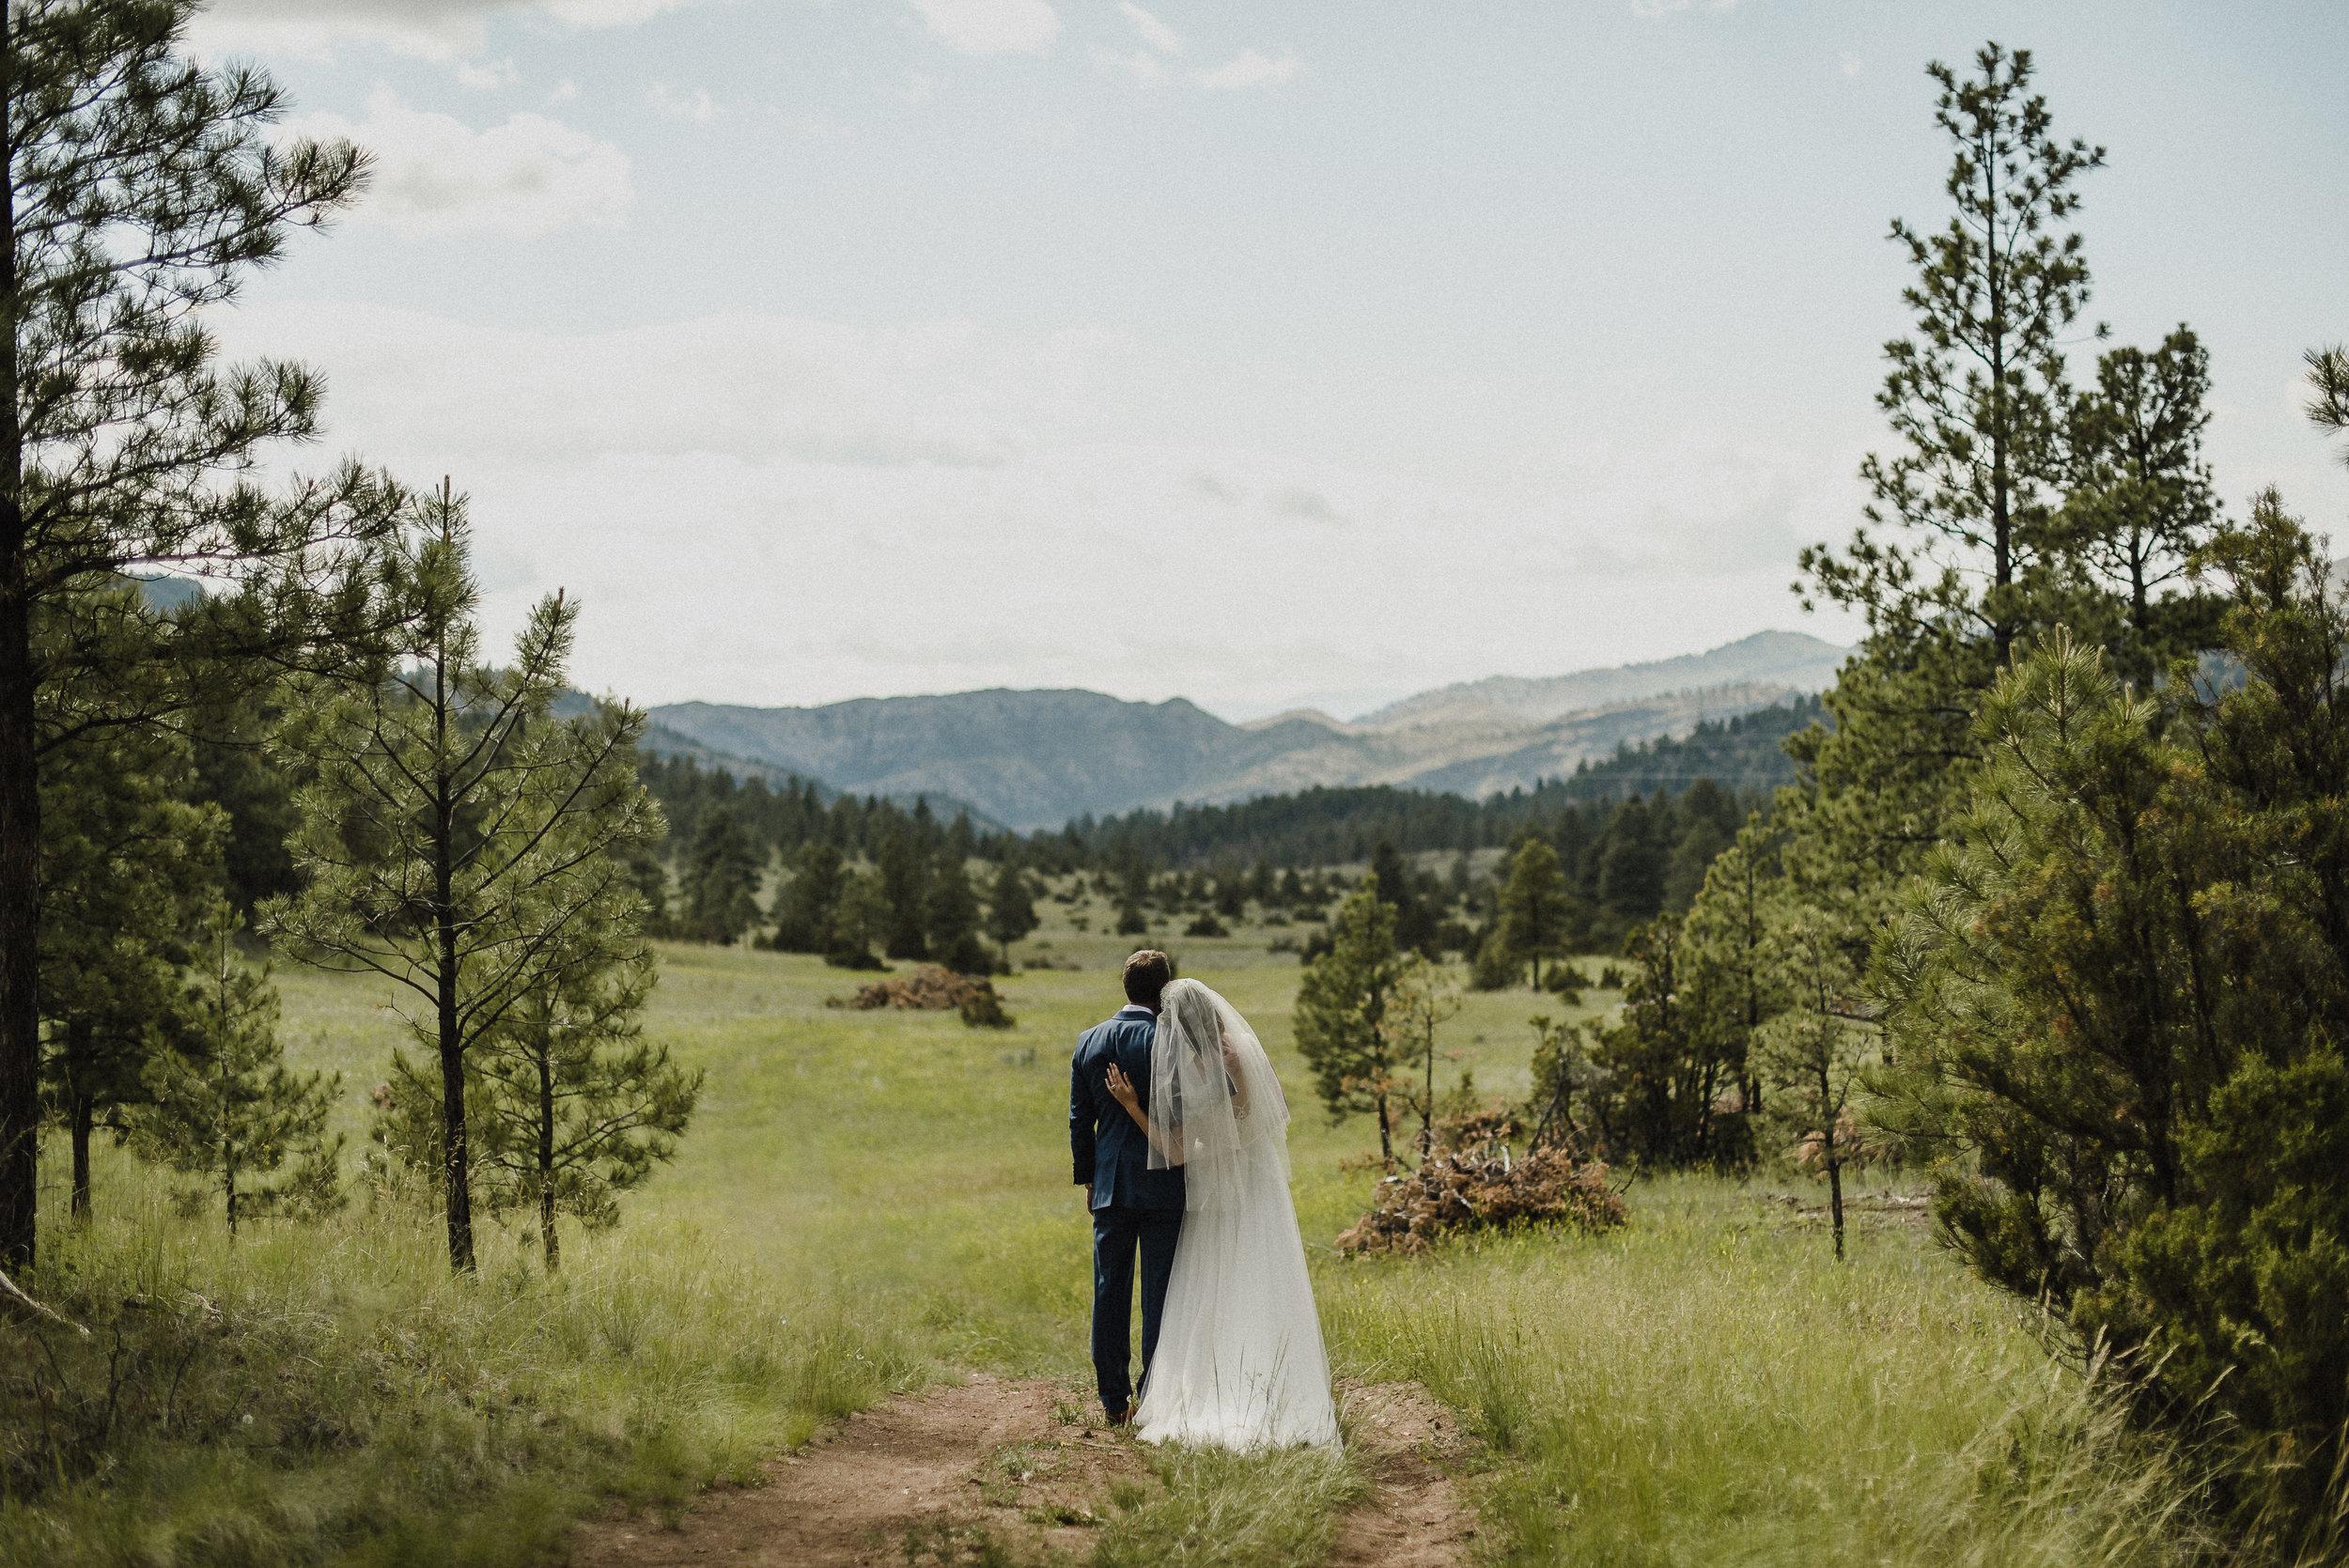 Stunning Scenery at Summer Star Ranch Helena wedding venue